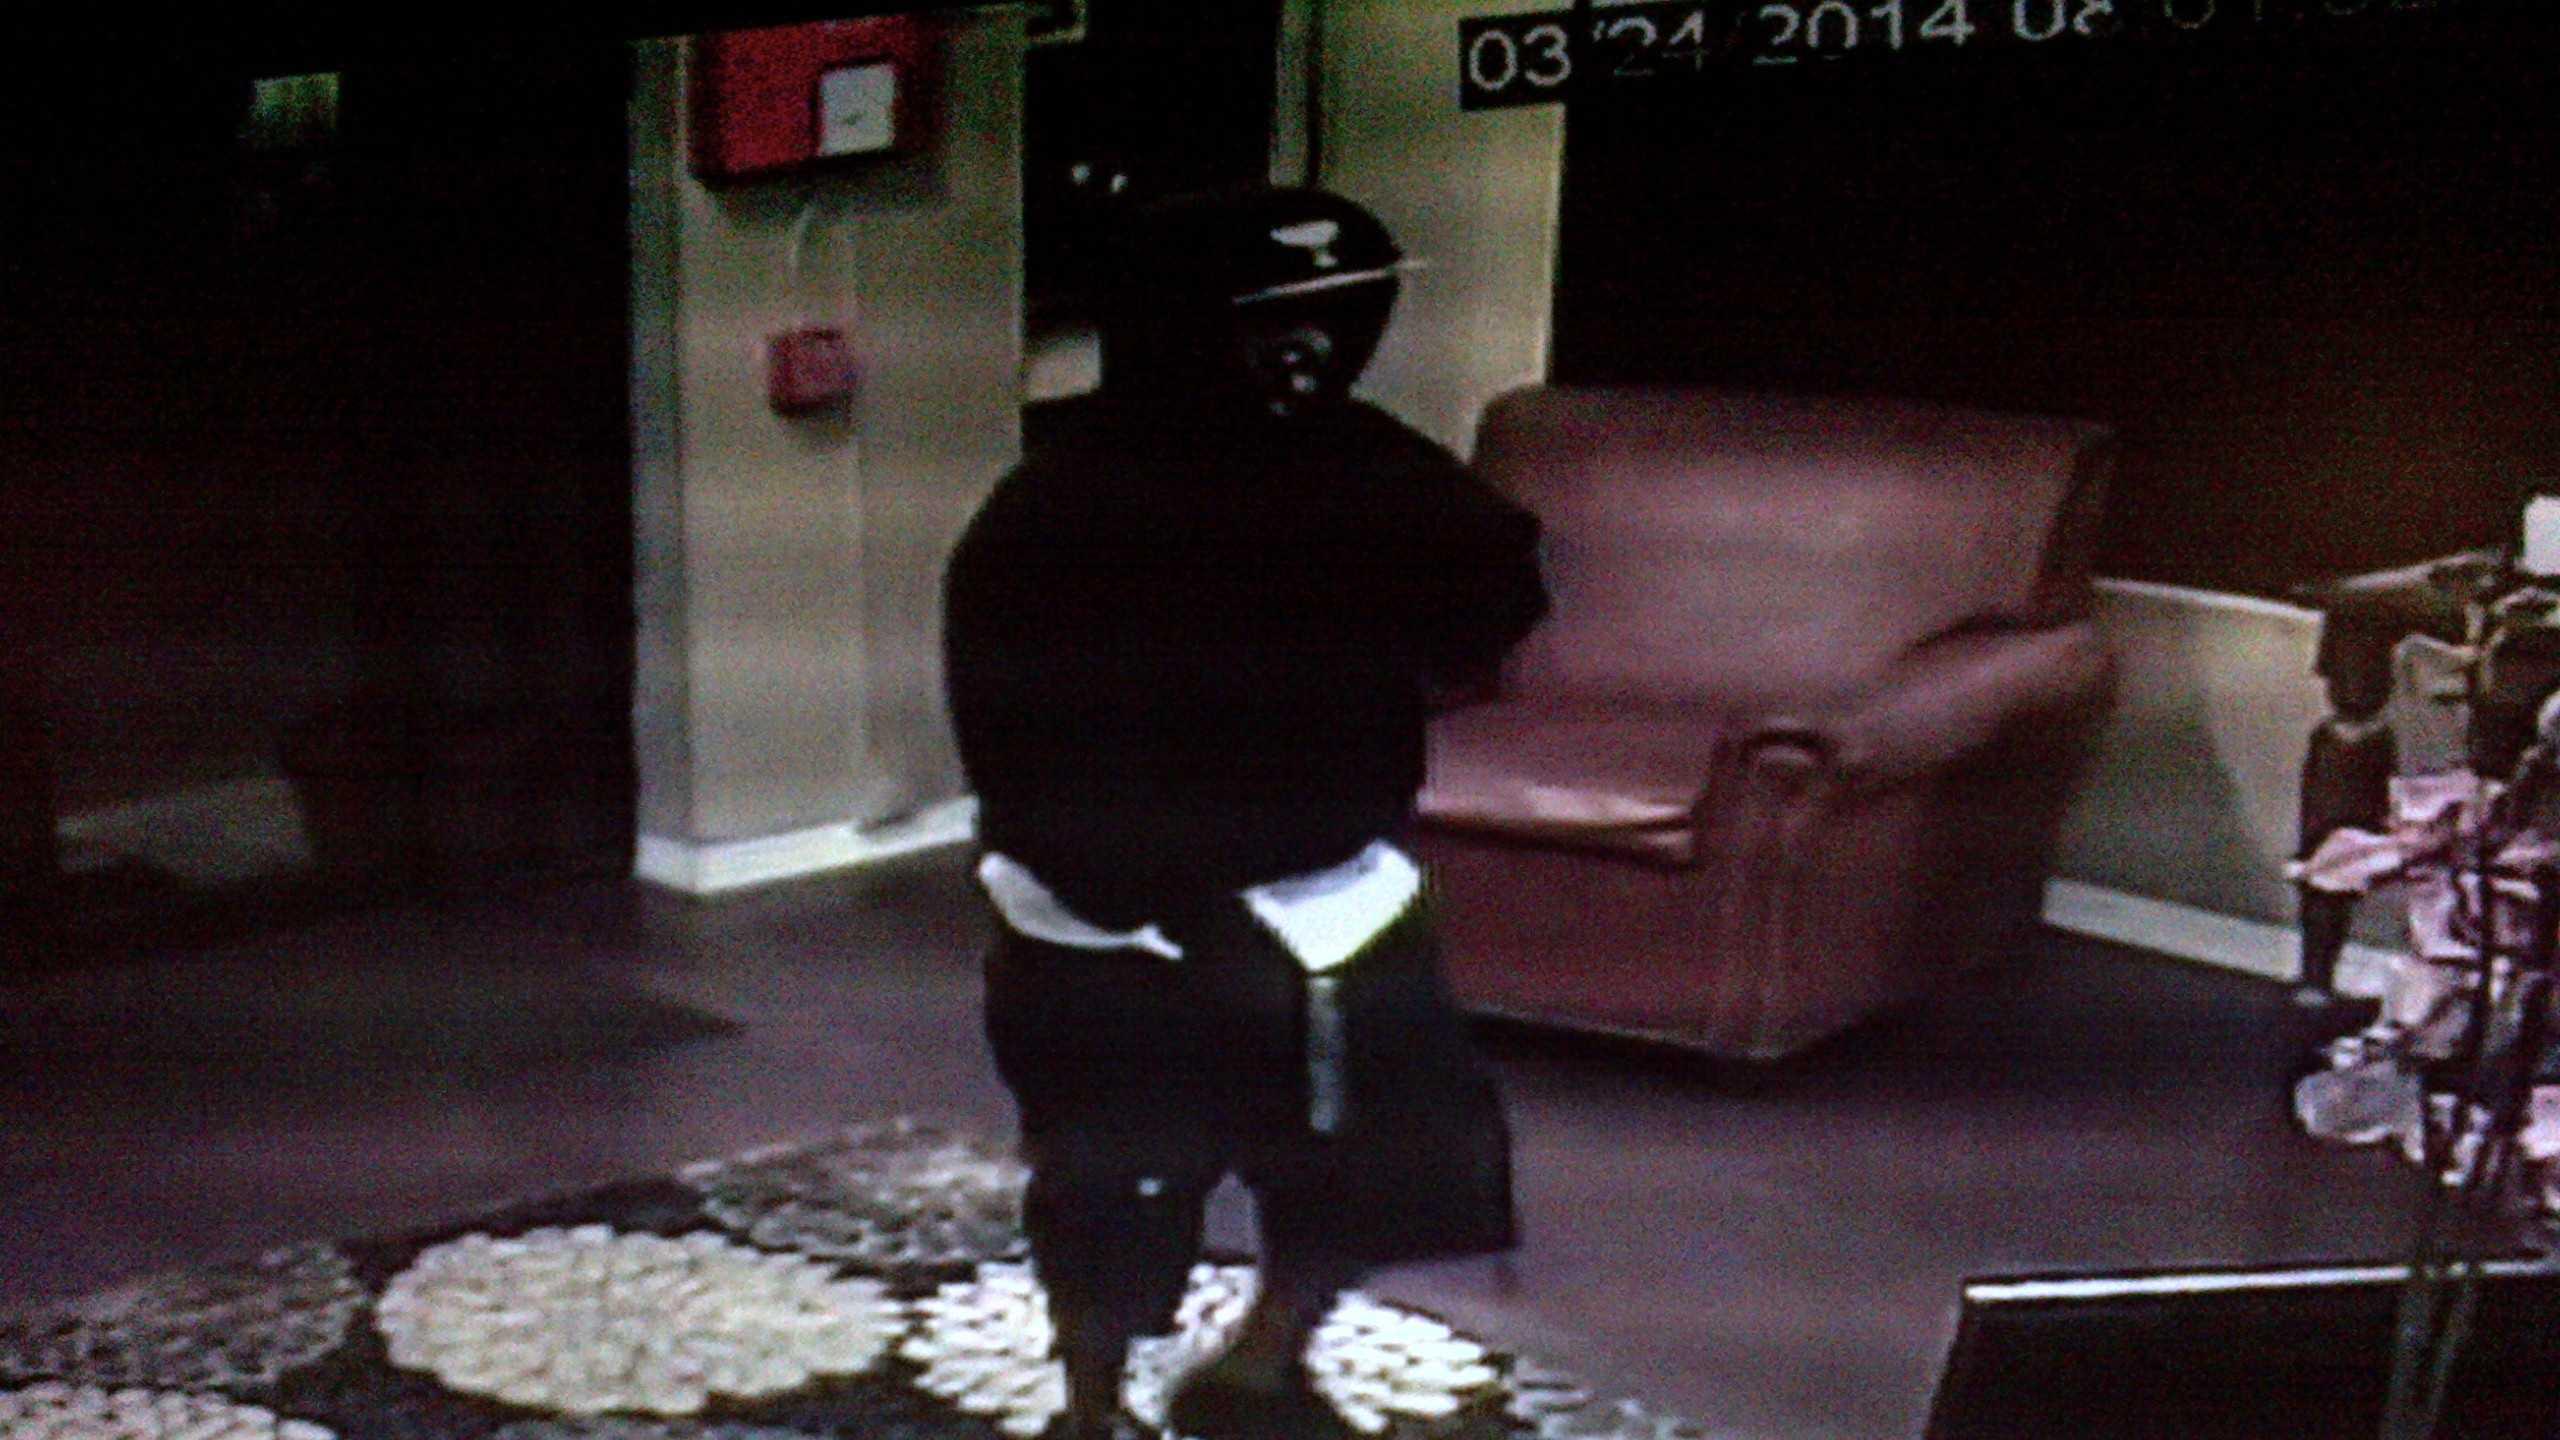 Rodeway Inn Surveillance Still